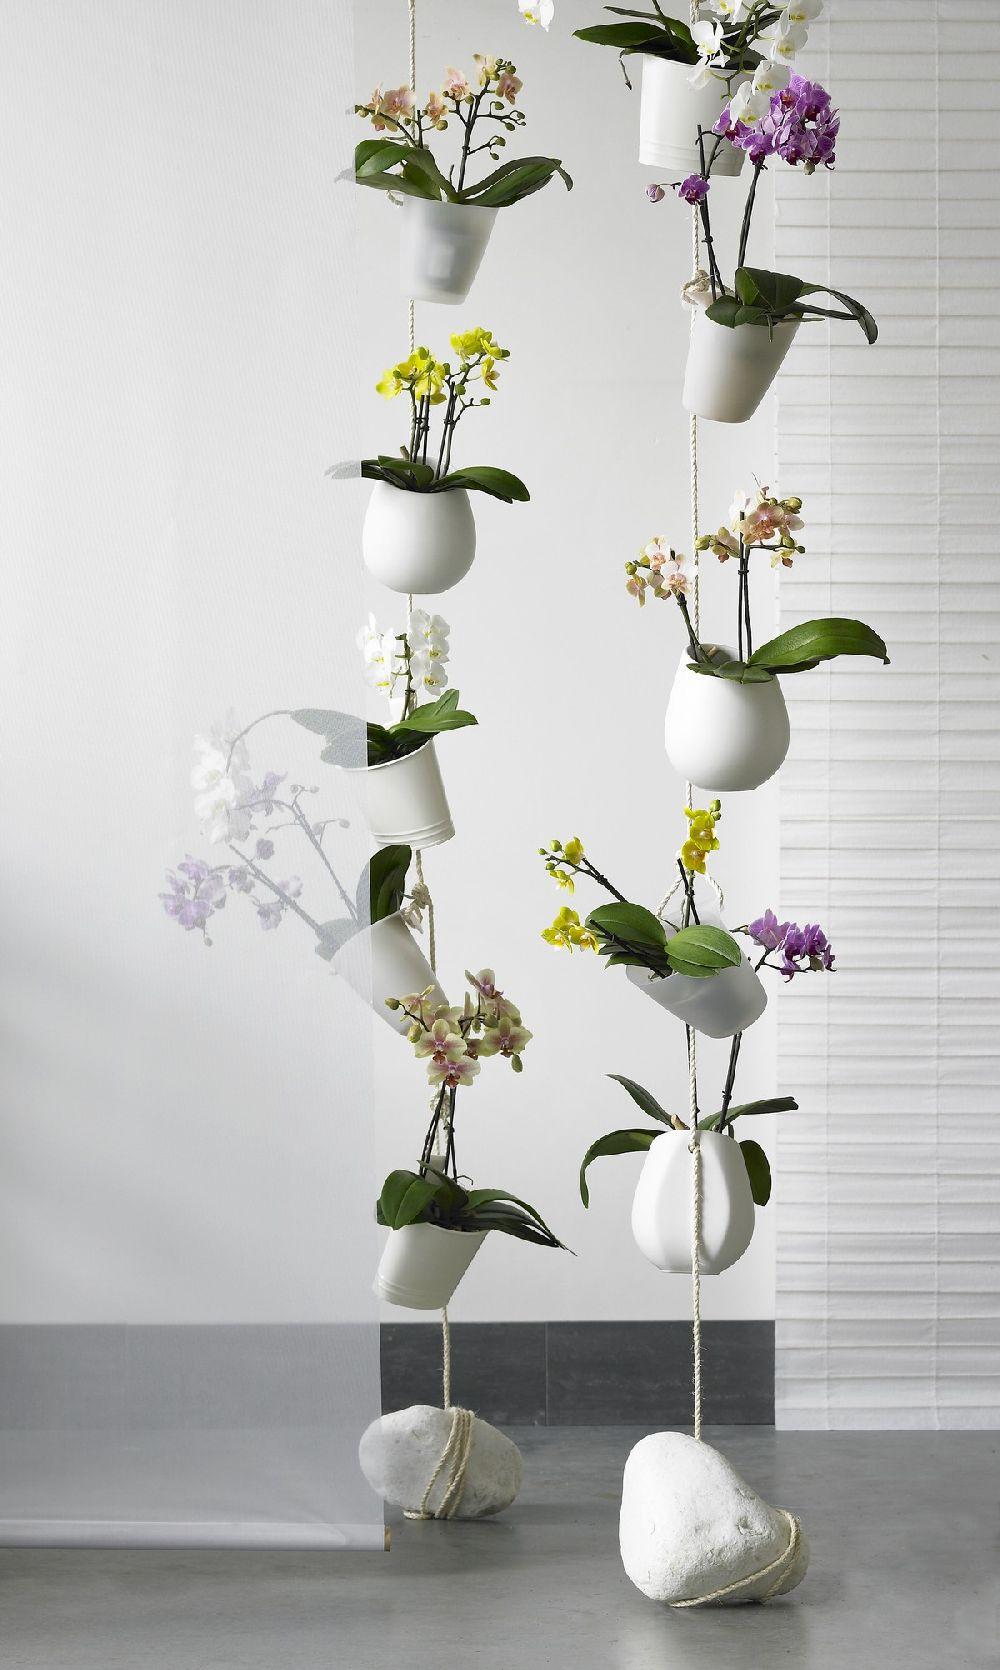 adelaparvu.com despre tratamentul pentru orhideea cu radacini putrezite si frunze ingalbenite, Text Carli Marian (1)